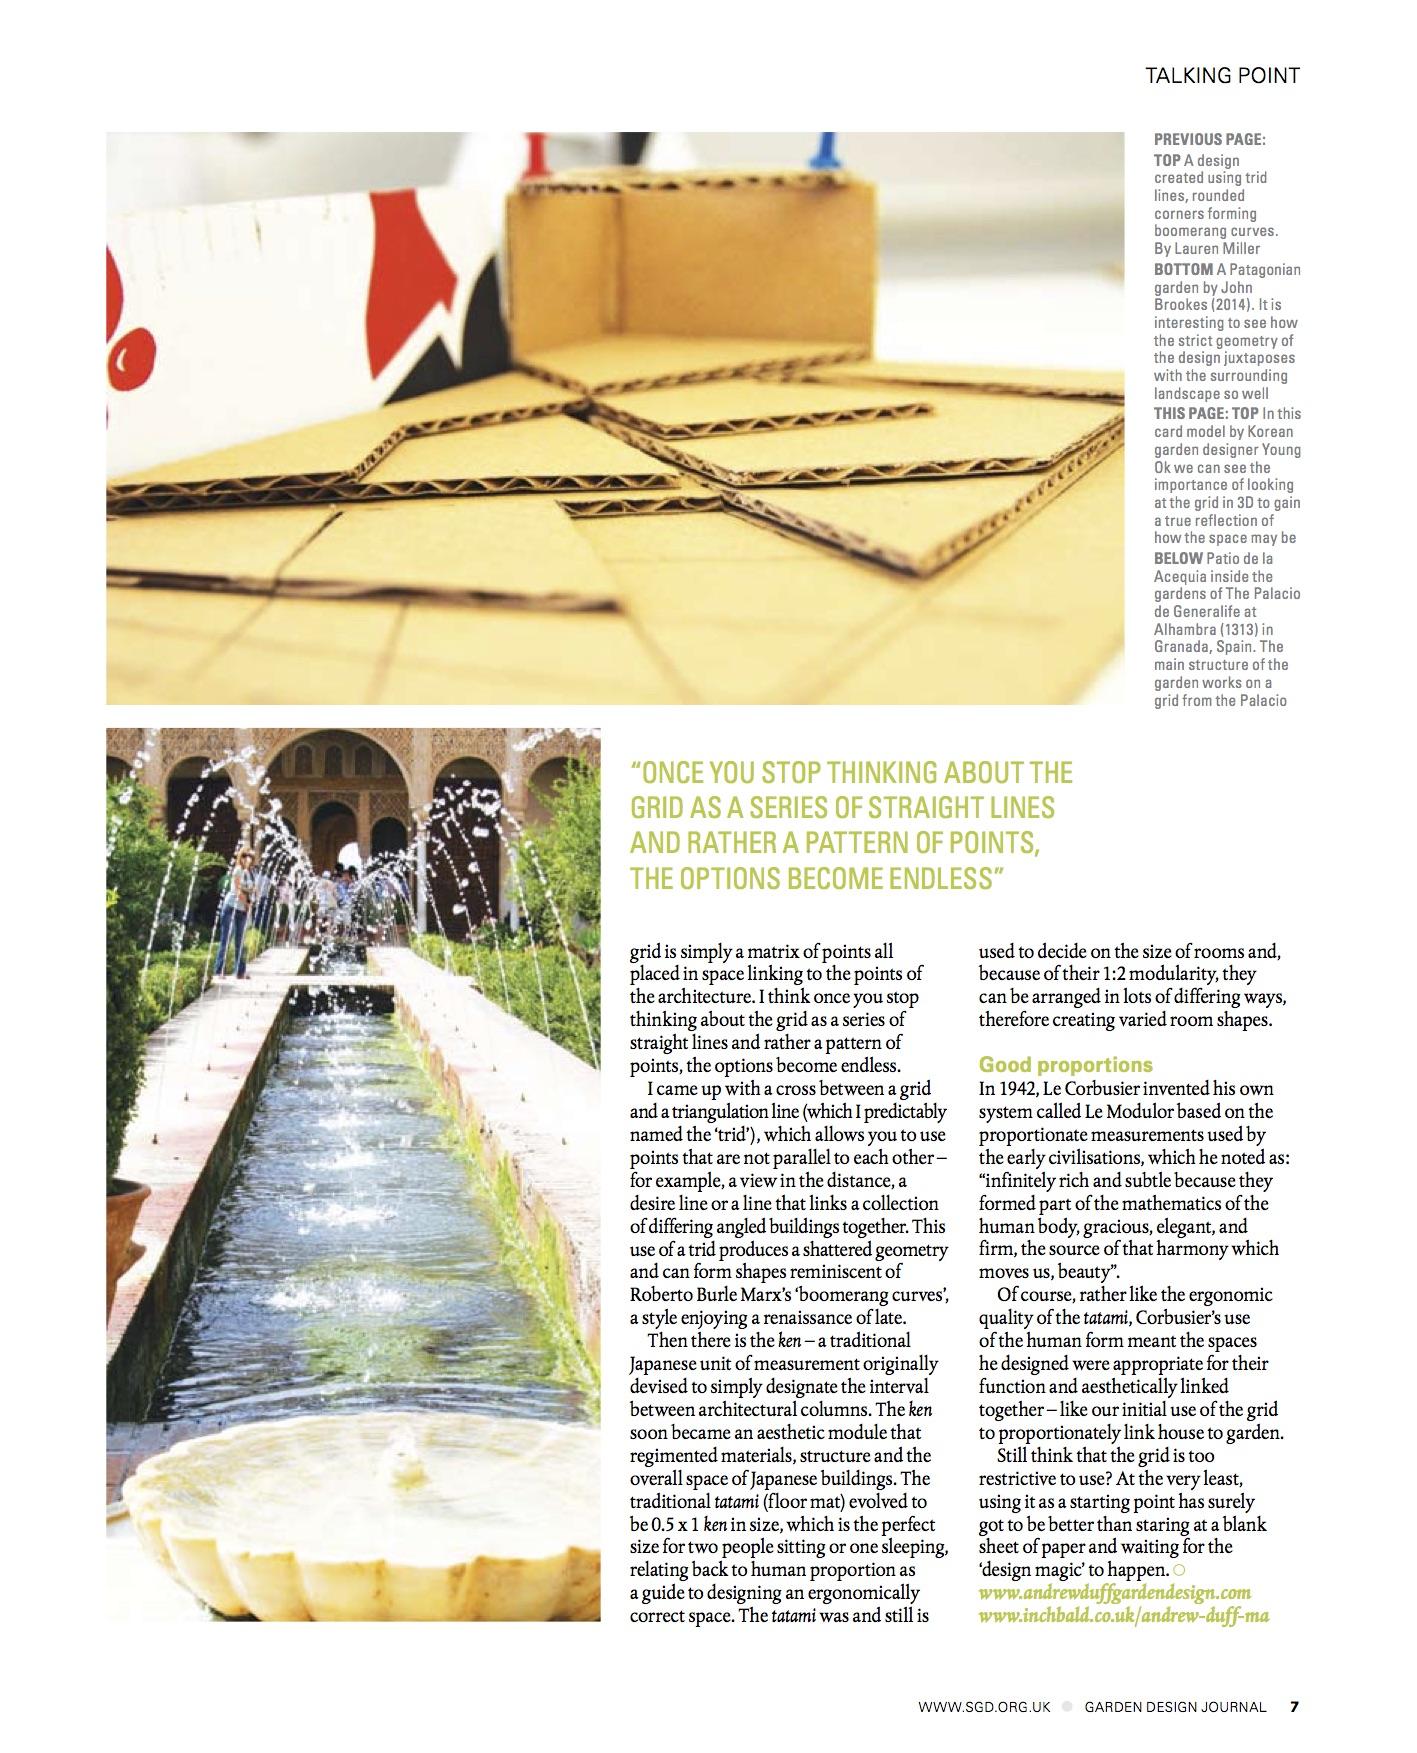 article in the garden design journal